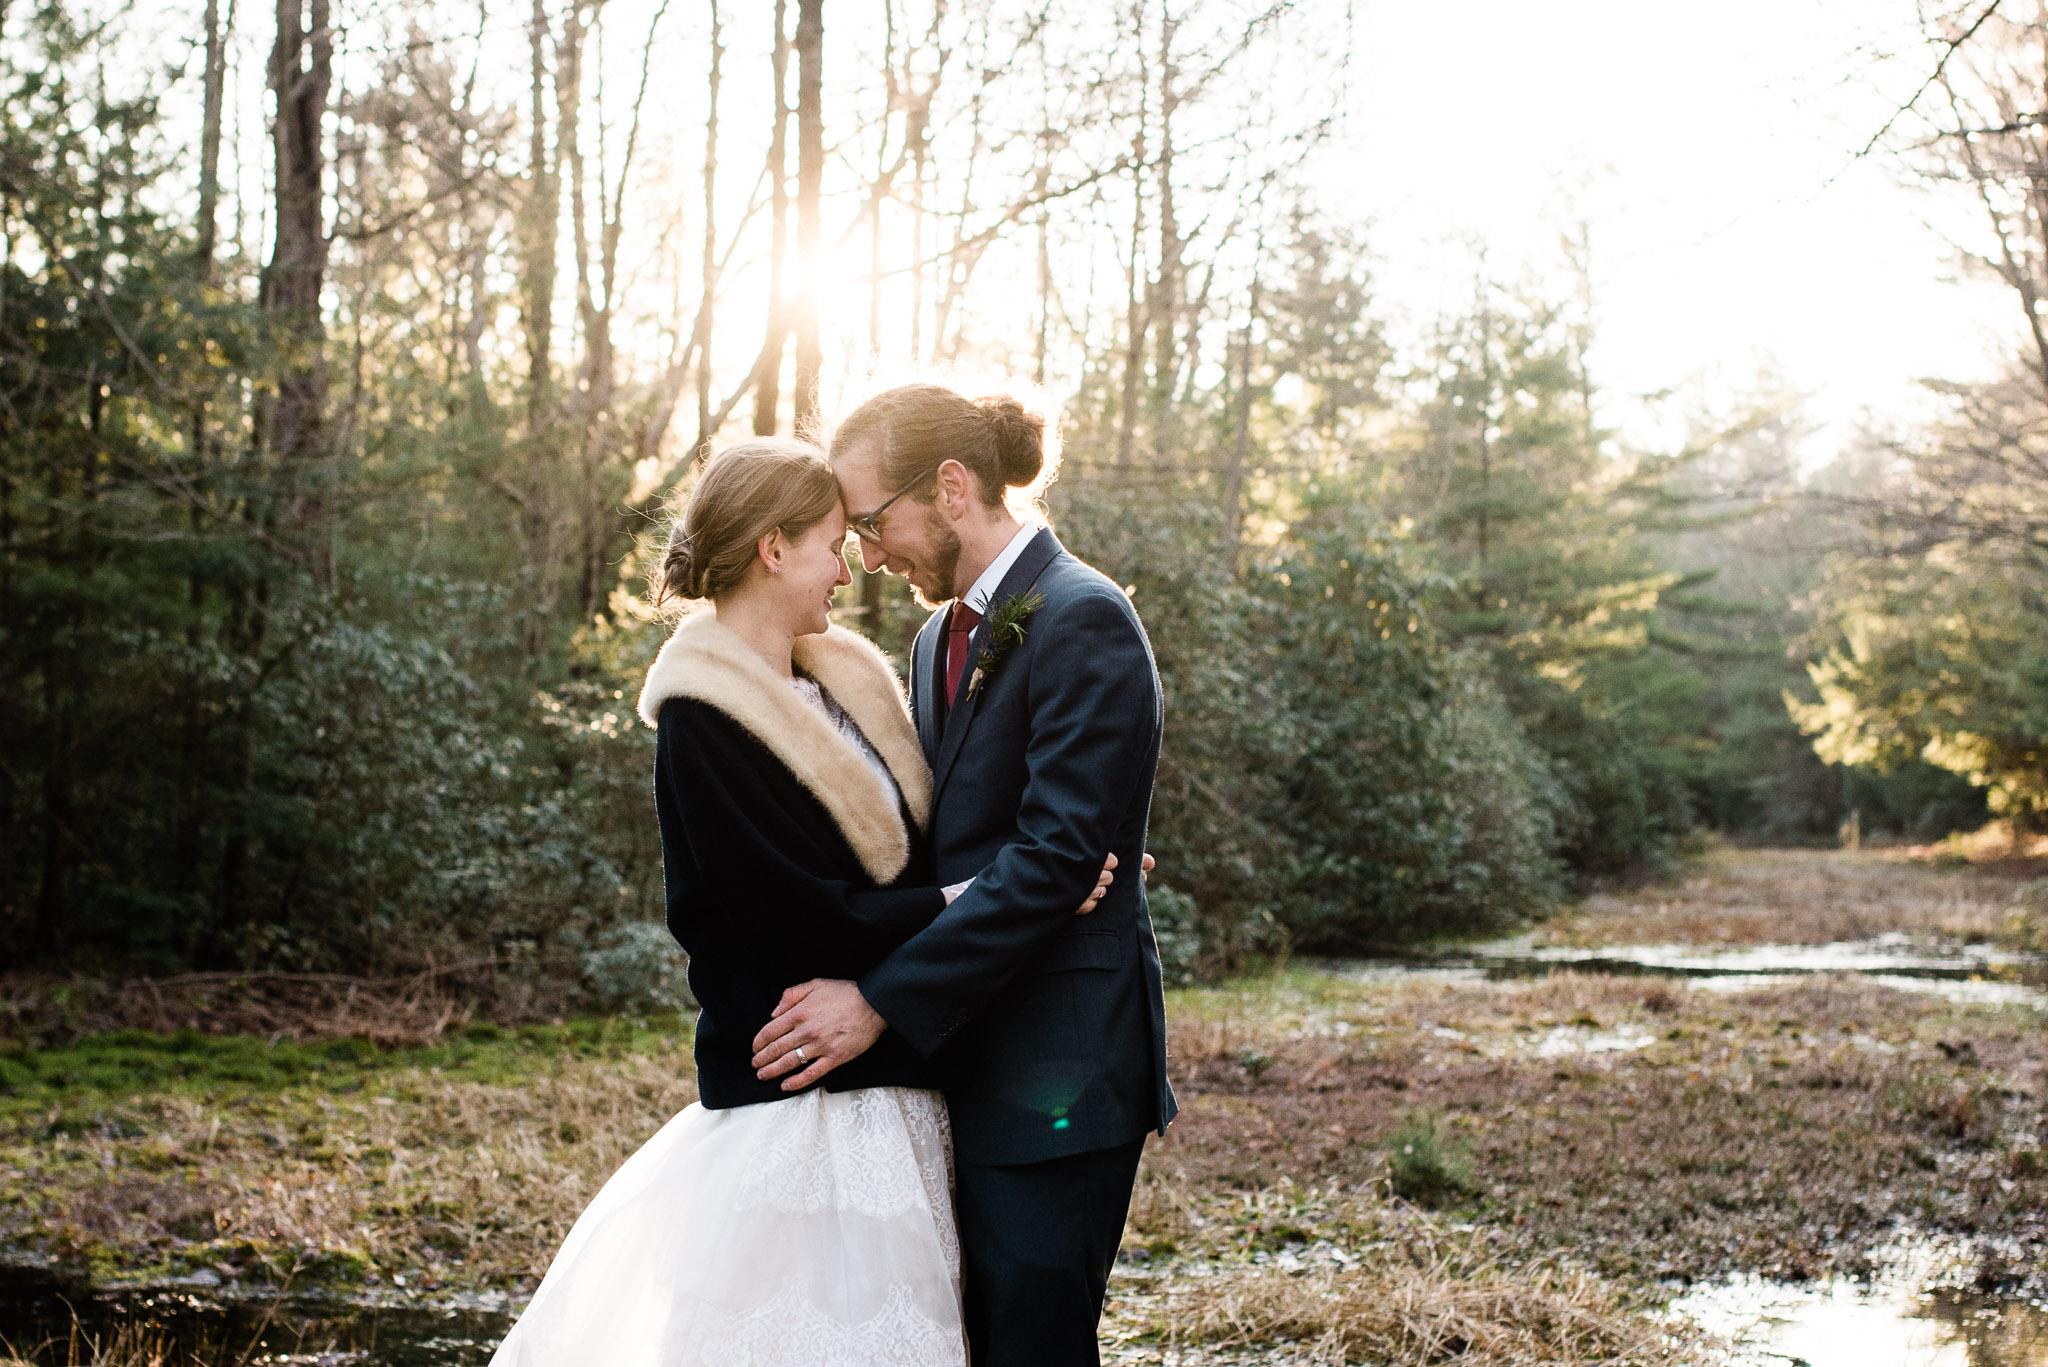 Wedding Couples portrait, Ligonier Wedding Photographer, Ligonier PA wedding, wedding potraits-6945.jpg